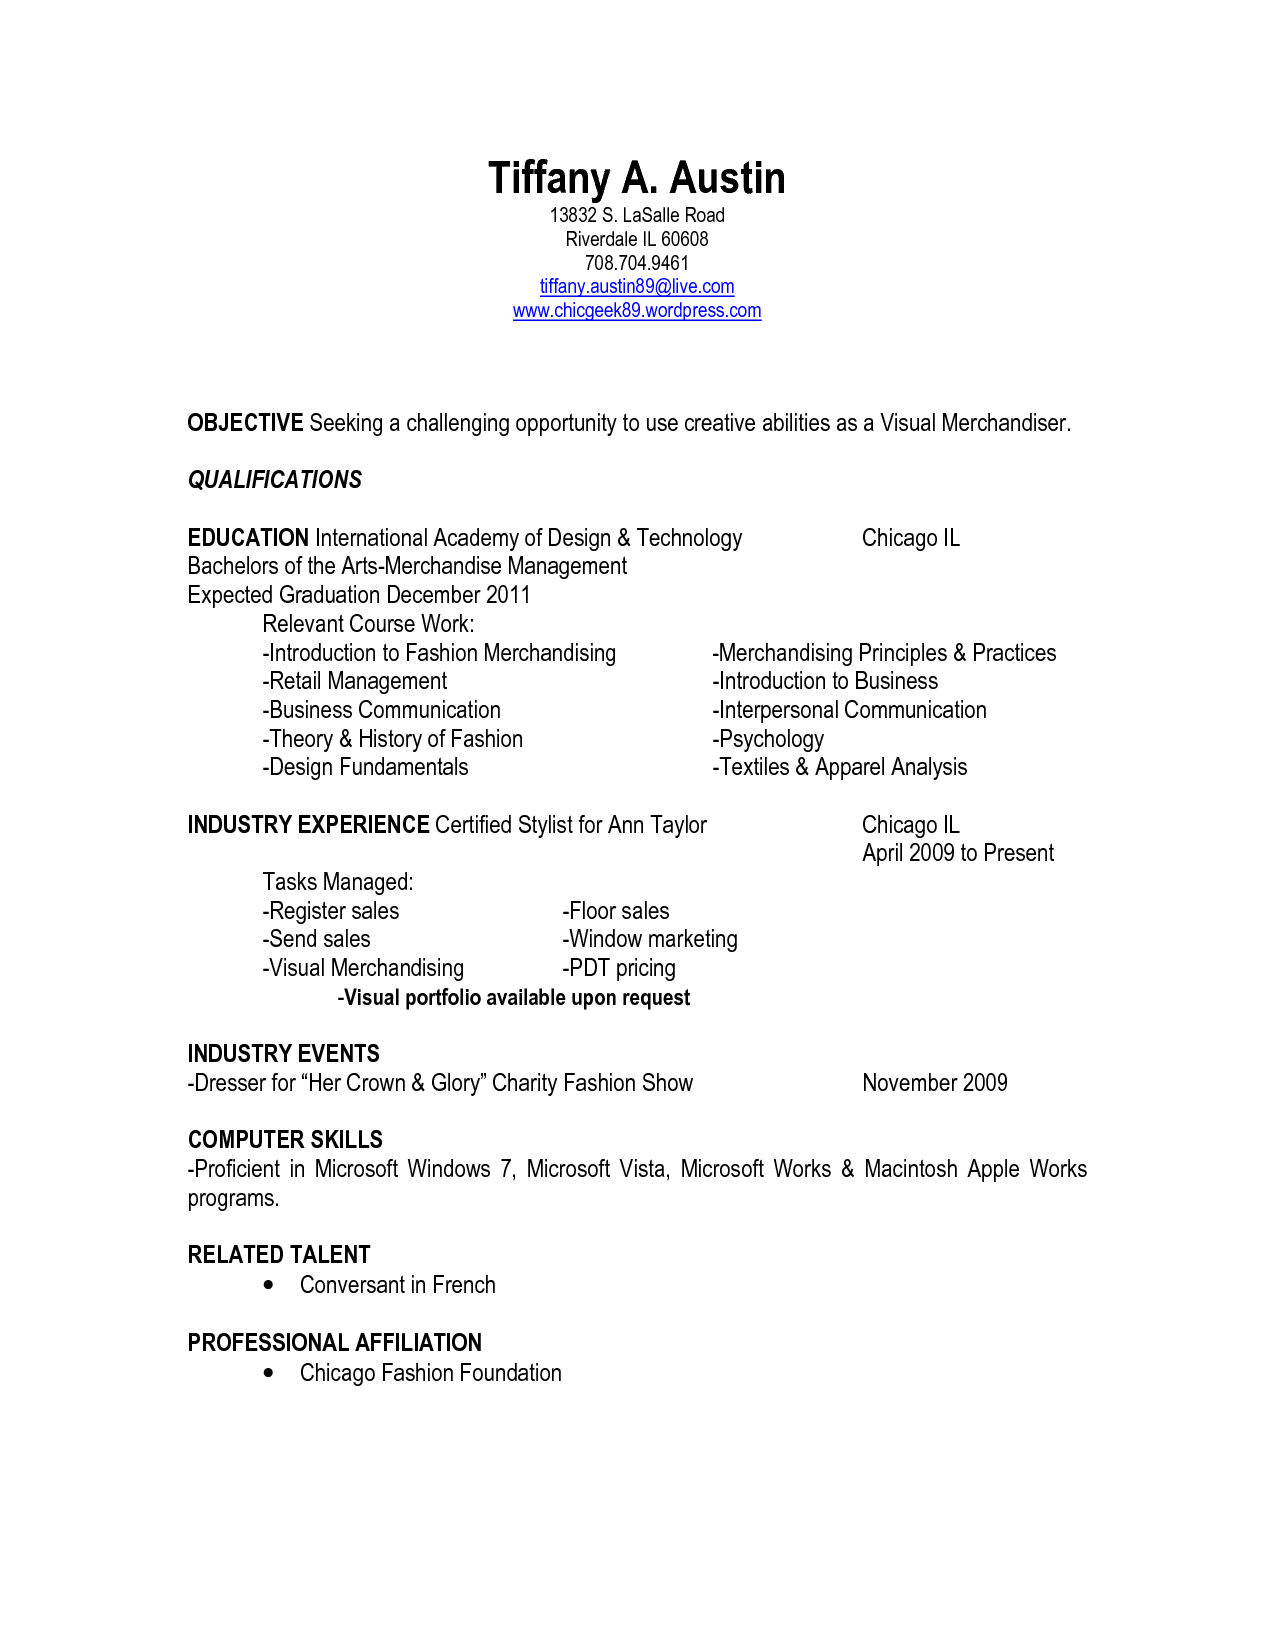 Resume Templates Tamu Resume Templates Resume Templates Resume Examples Professional Resume Examples